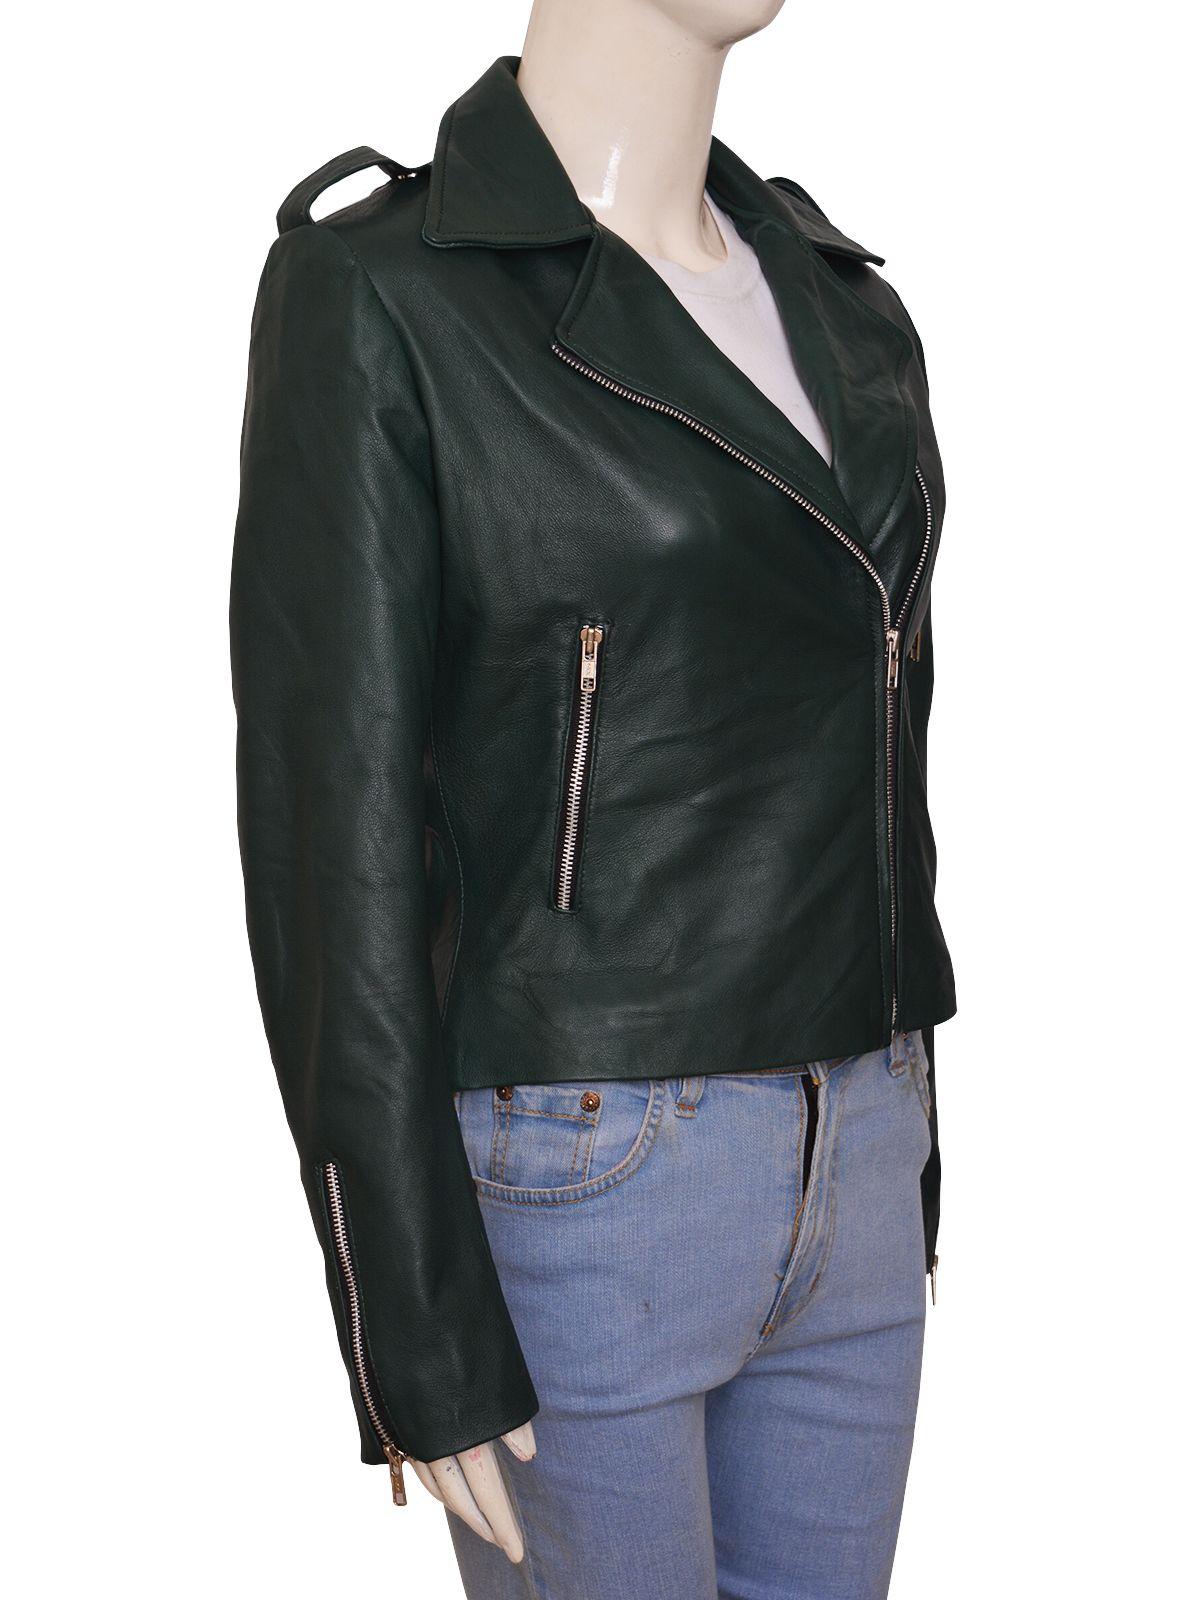 Pine Green Super Cool Leather Jacket Women Jackets Mauvetree Leather Jackets Women Leather Jacket Jackets For Women [ 1600 x 1200 Pixel ]